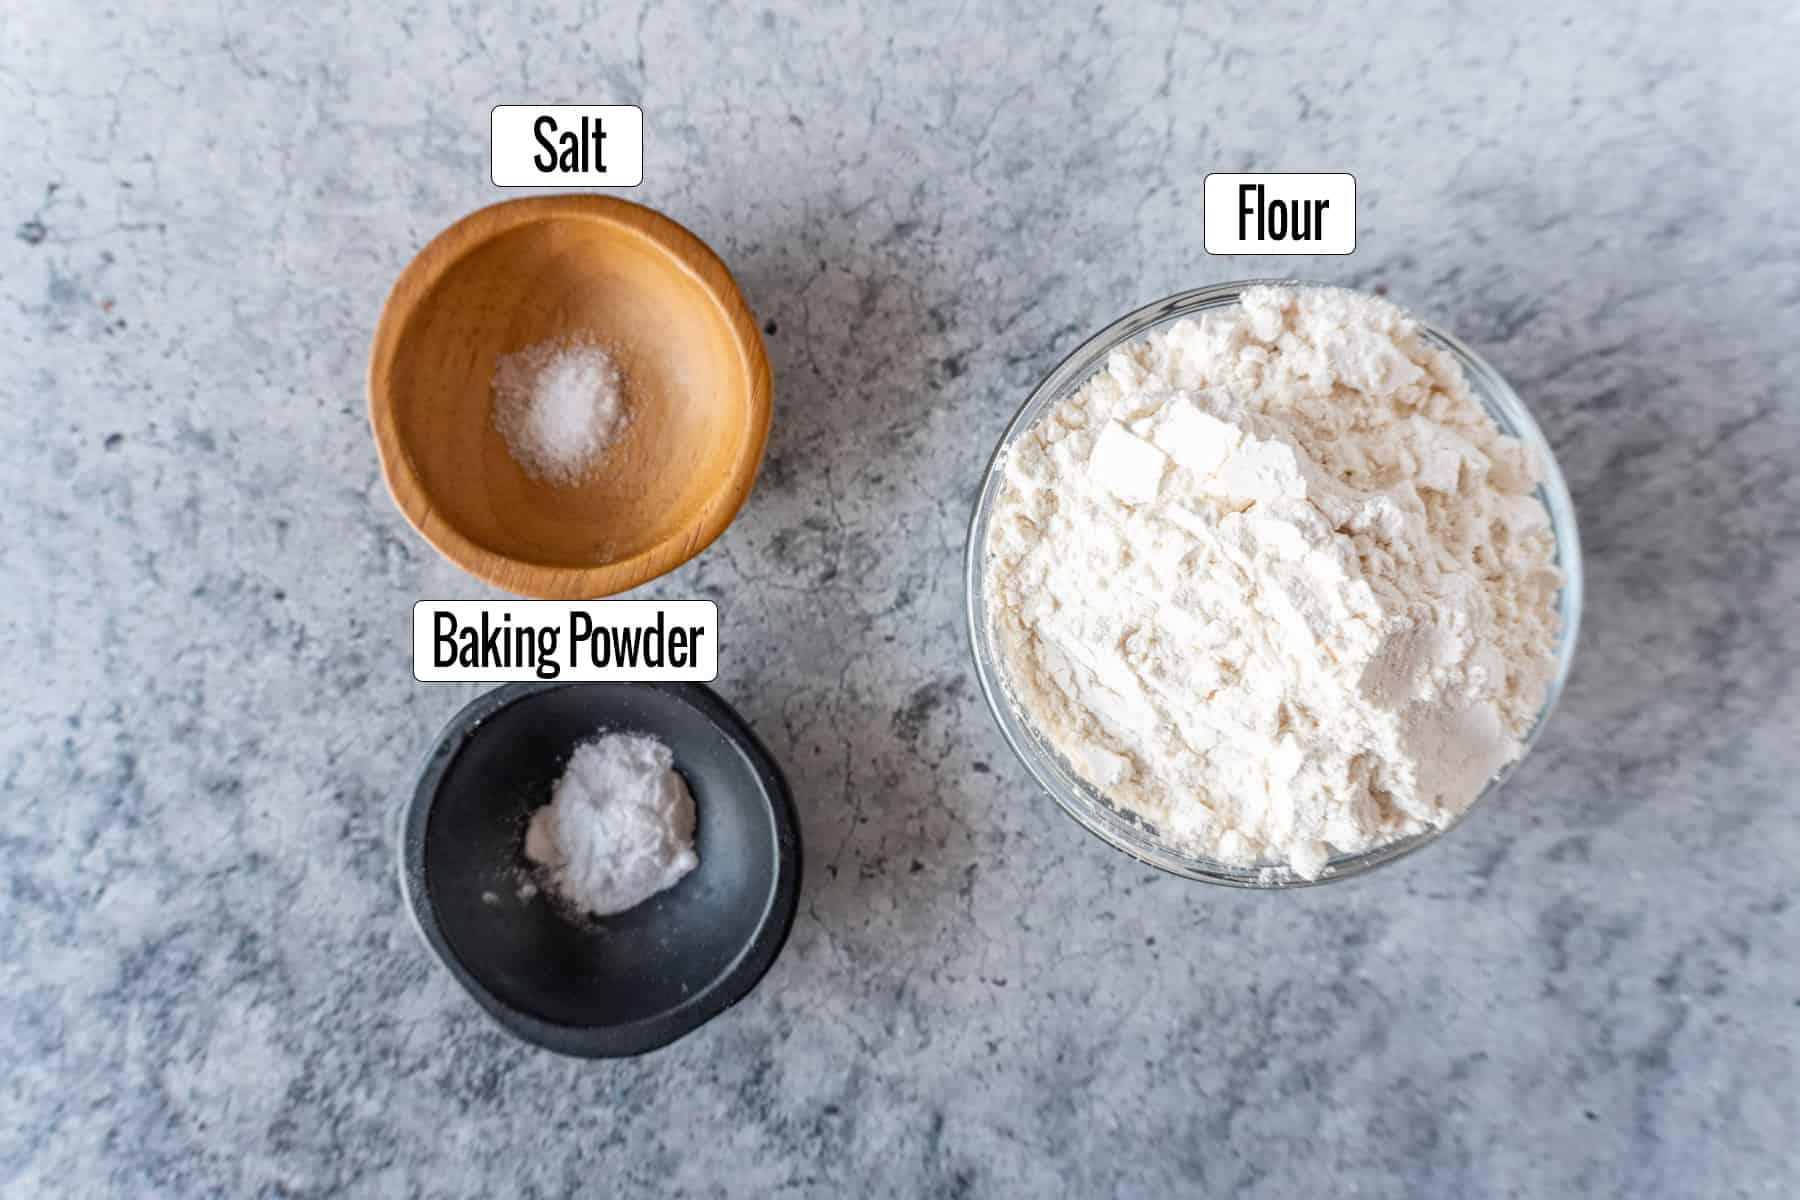 ingredients in bowls: salt. baking powder, flour